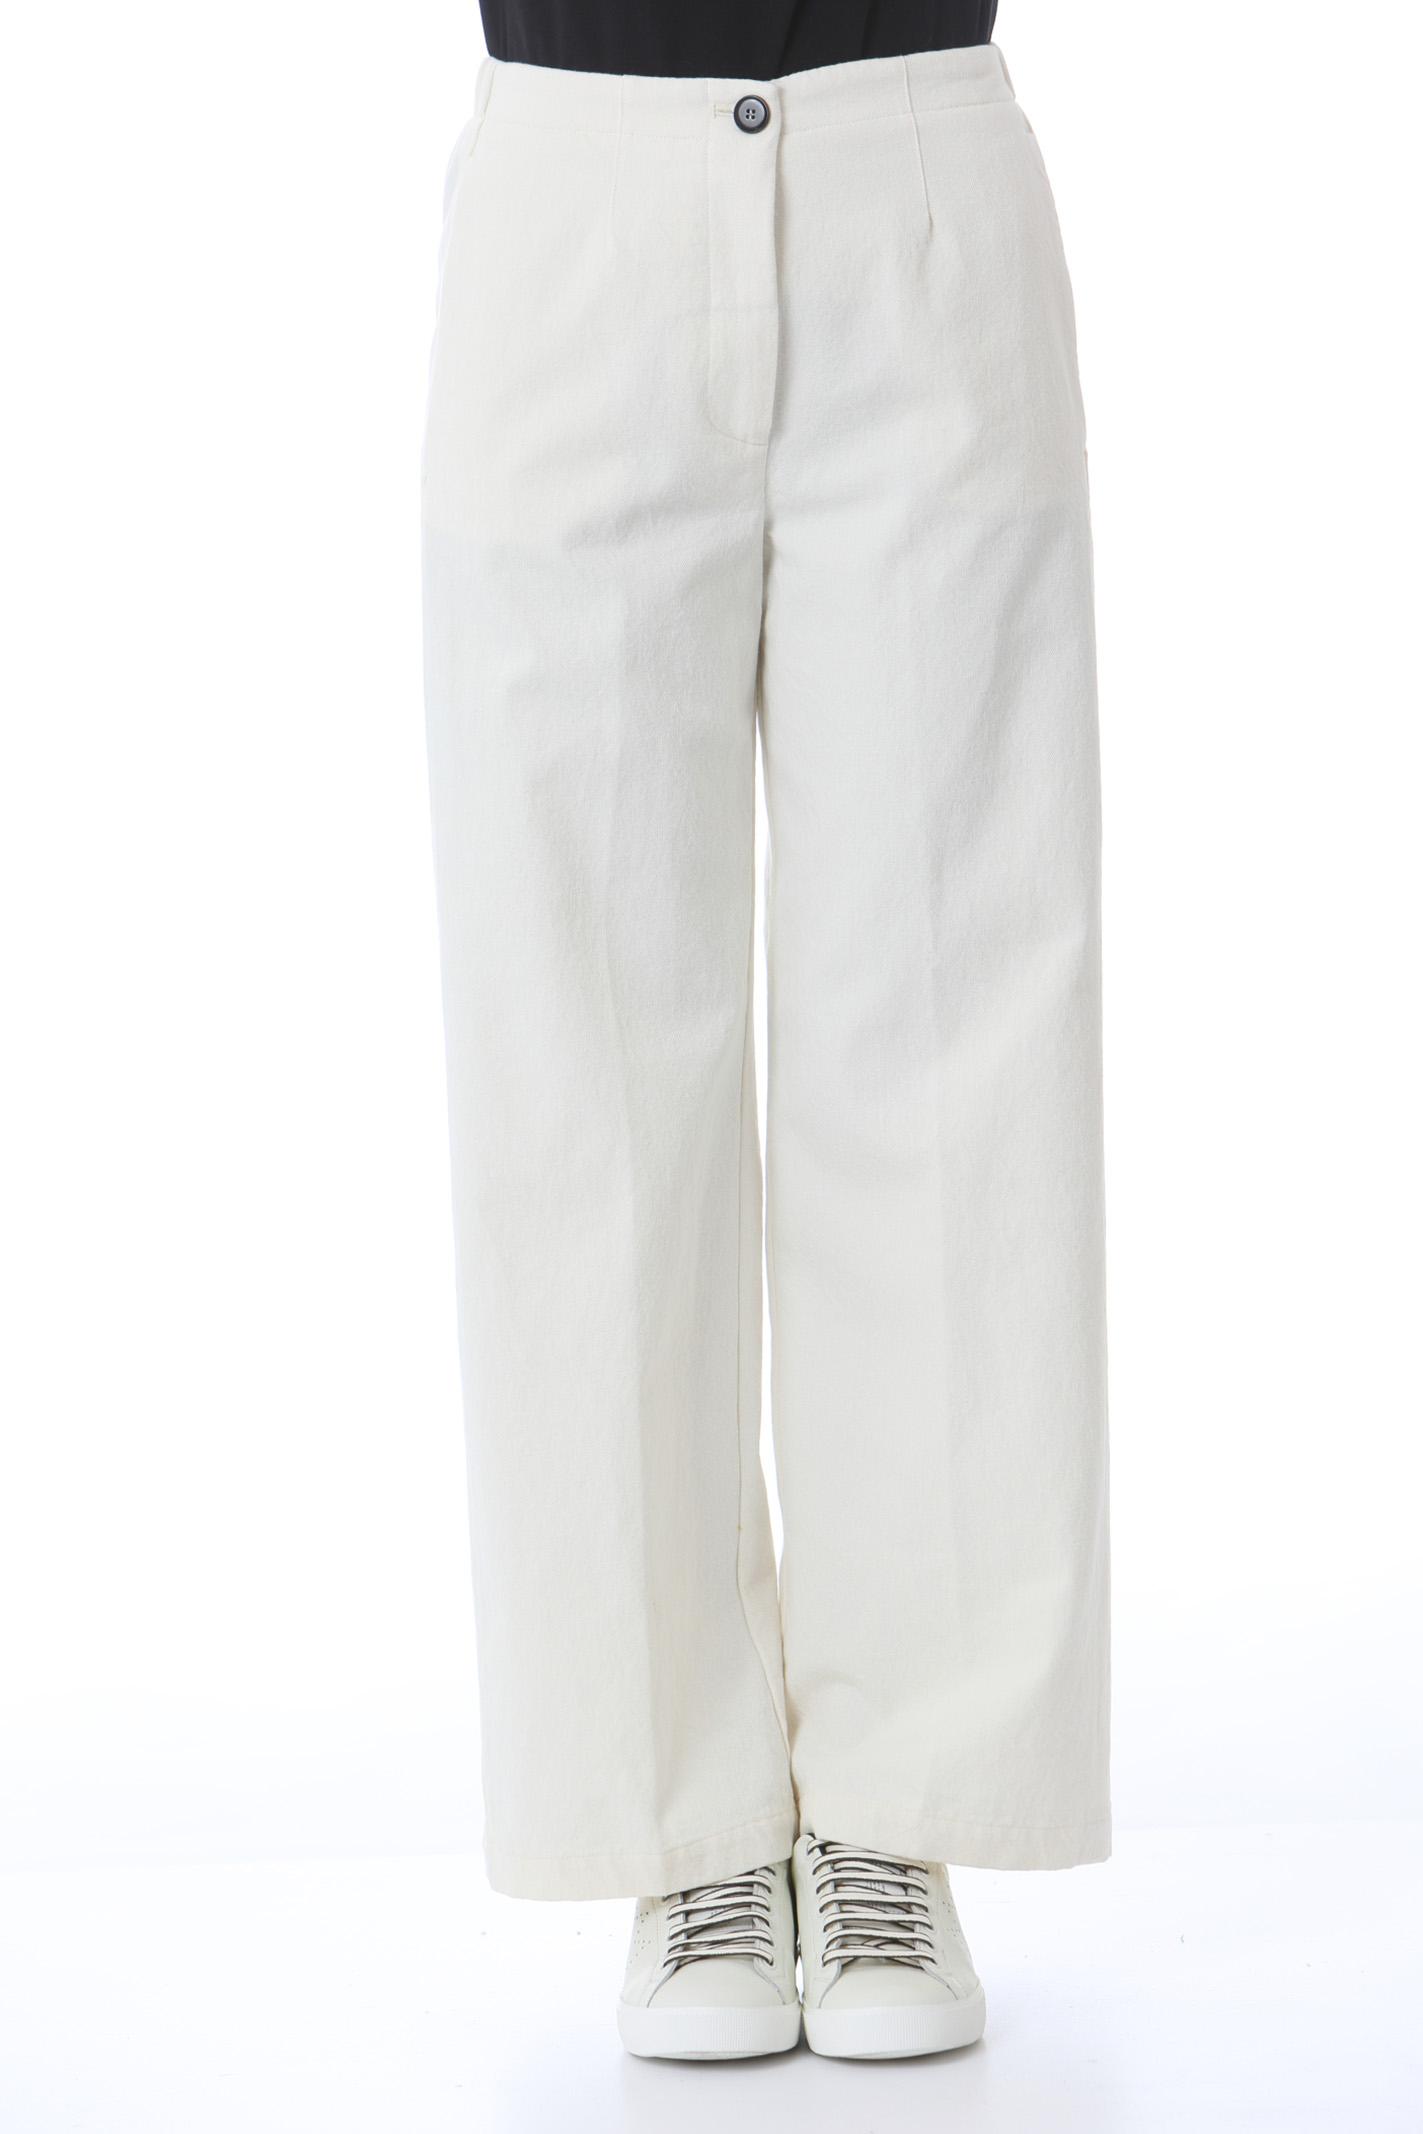 Pantalone fluido donna POMANDERE   Pantaloni   2121-7128/1053212